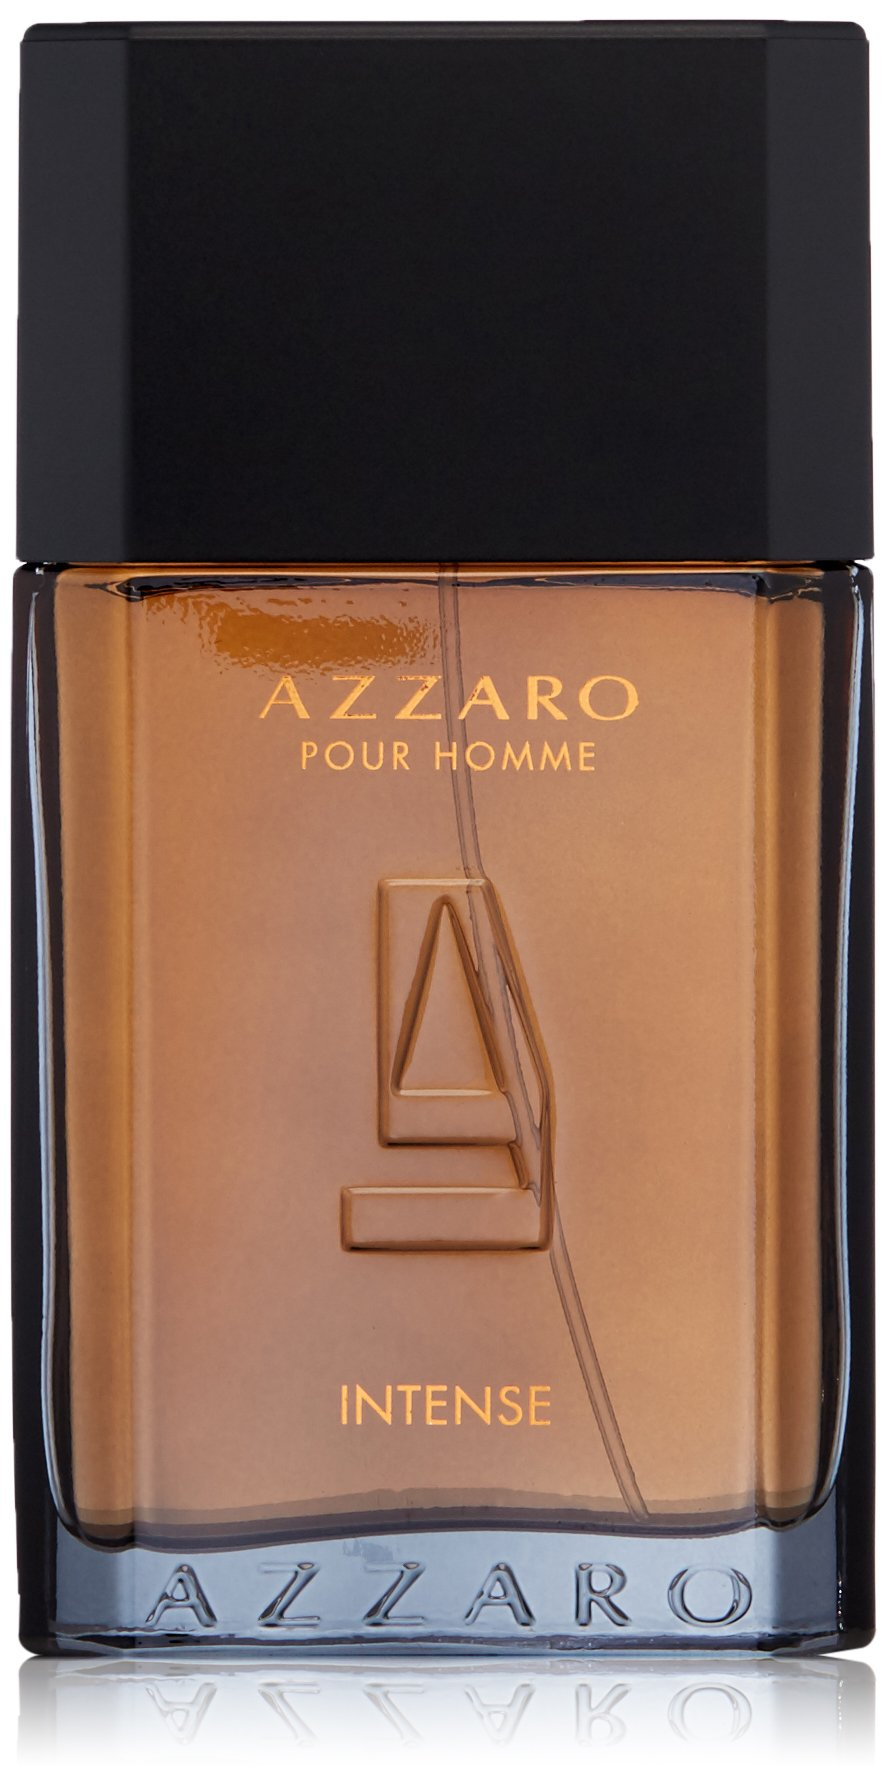 Azzaro Azzaro Pour Homme Intense Eau de Parfum Spray, 3.4 Fl. oz.